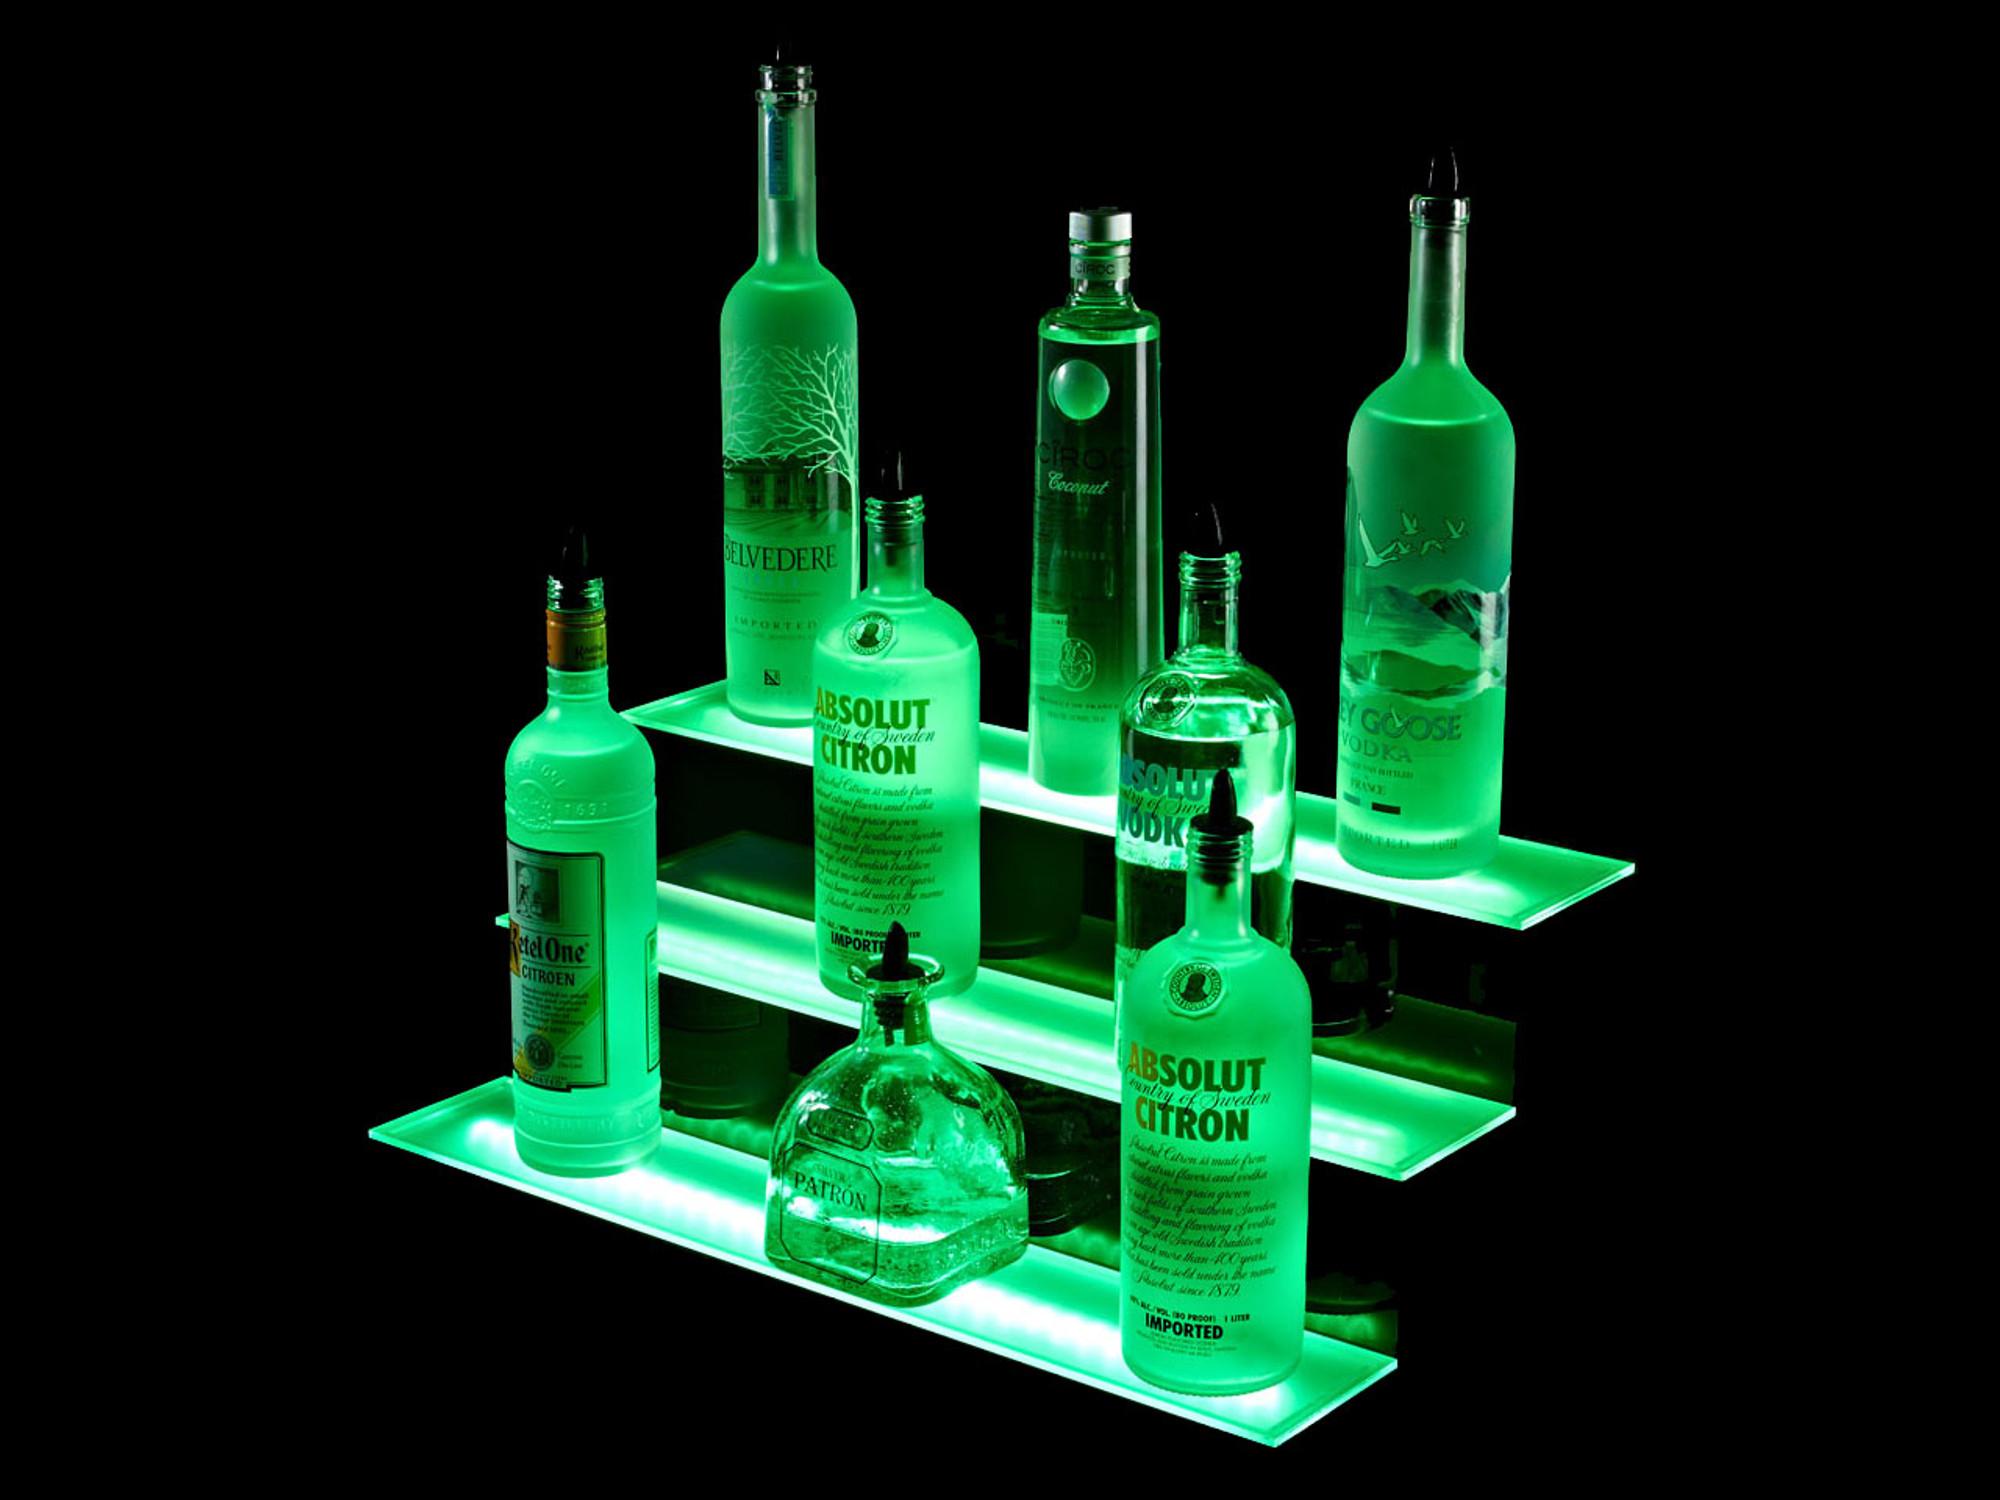 3 Tier Led Liquor Shelf Display further 34340015881749418 additionally 2 Tier Led Liquor Shelf Display moreover Polyester Briefs And Panties further Shelf Led Lights. on liquor shelves for led light strips